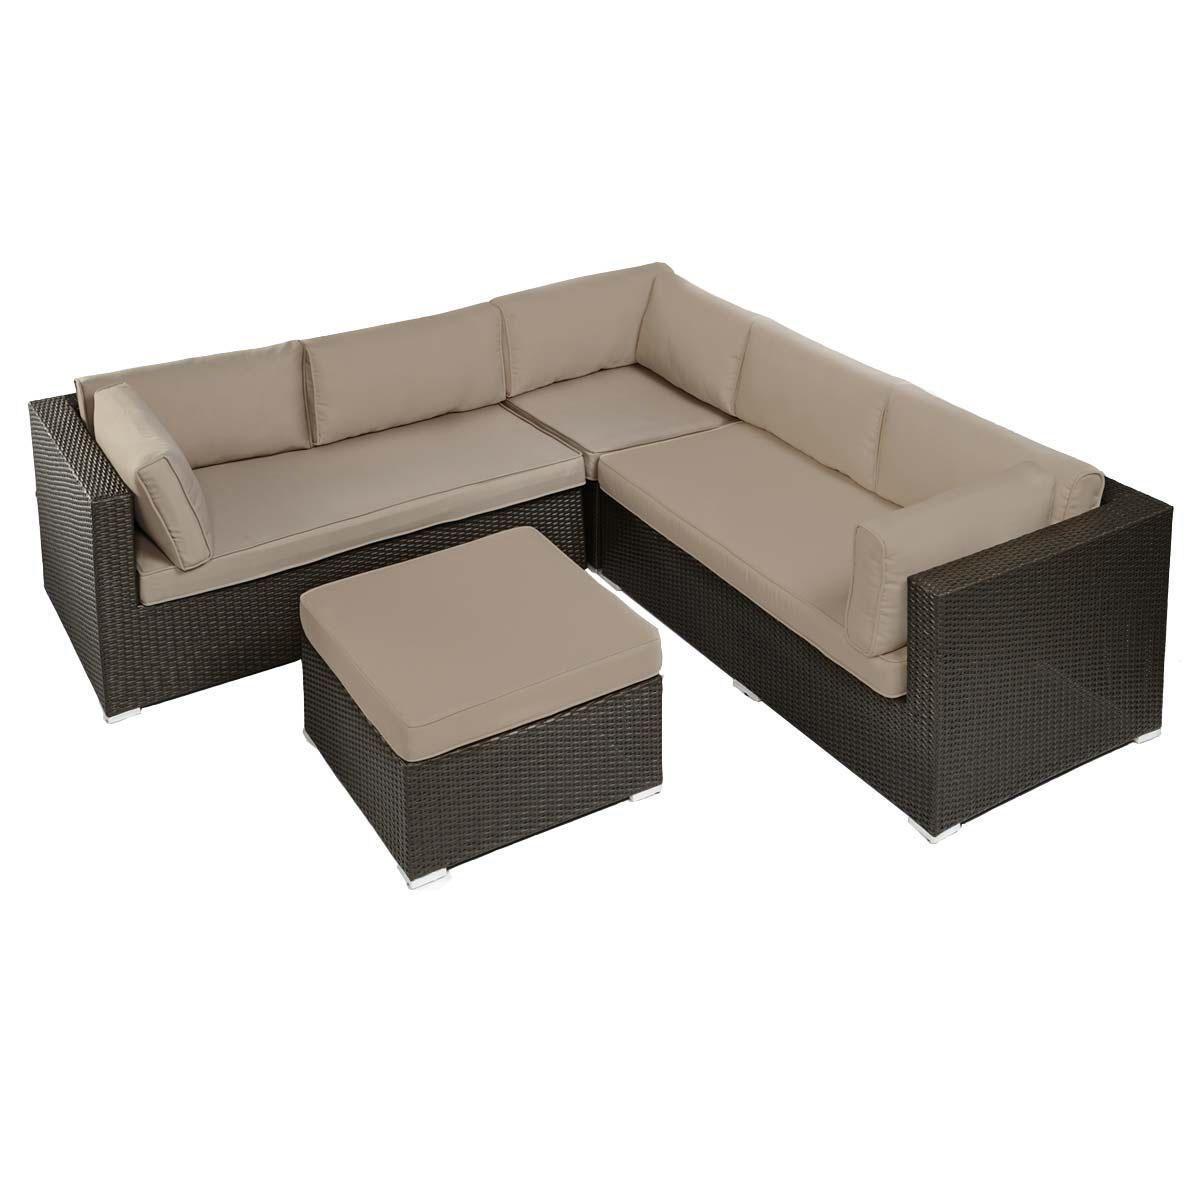 Free Gartenm Bel Rattan Lounge Set Tlg With Gartenmbel Polyrattan Lounge